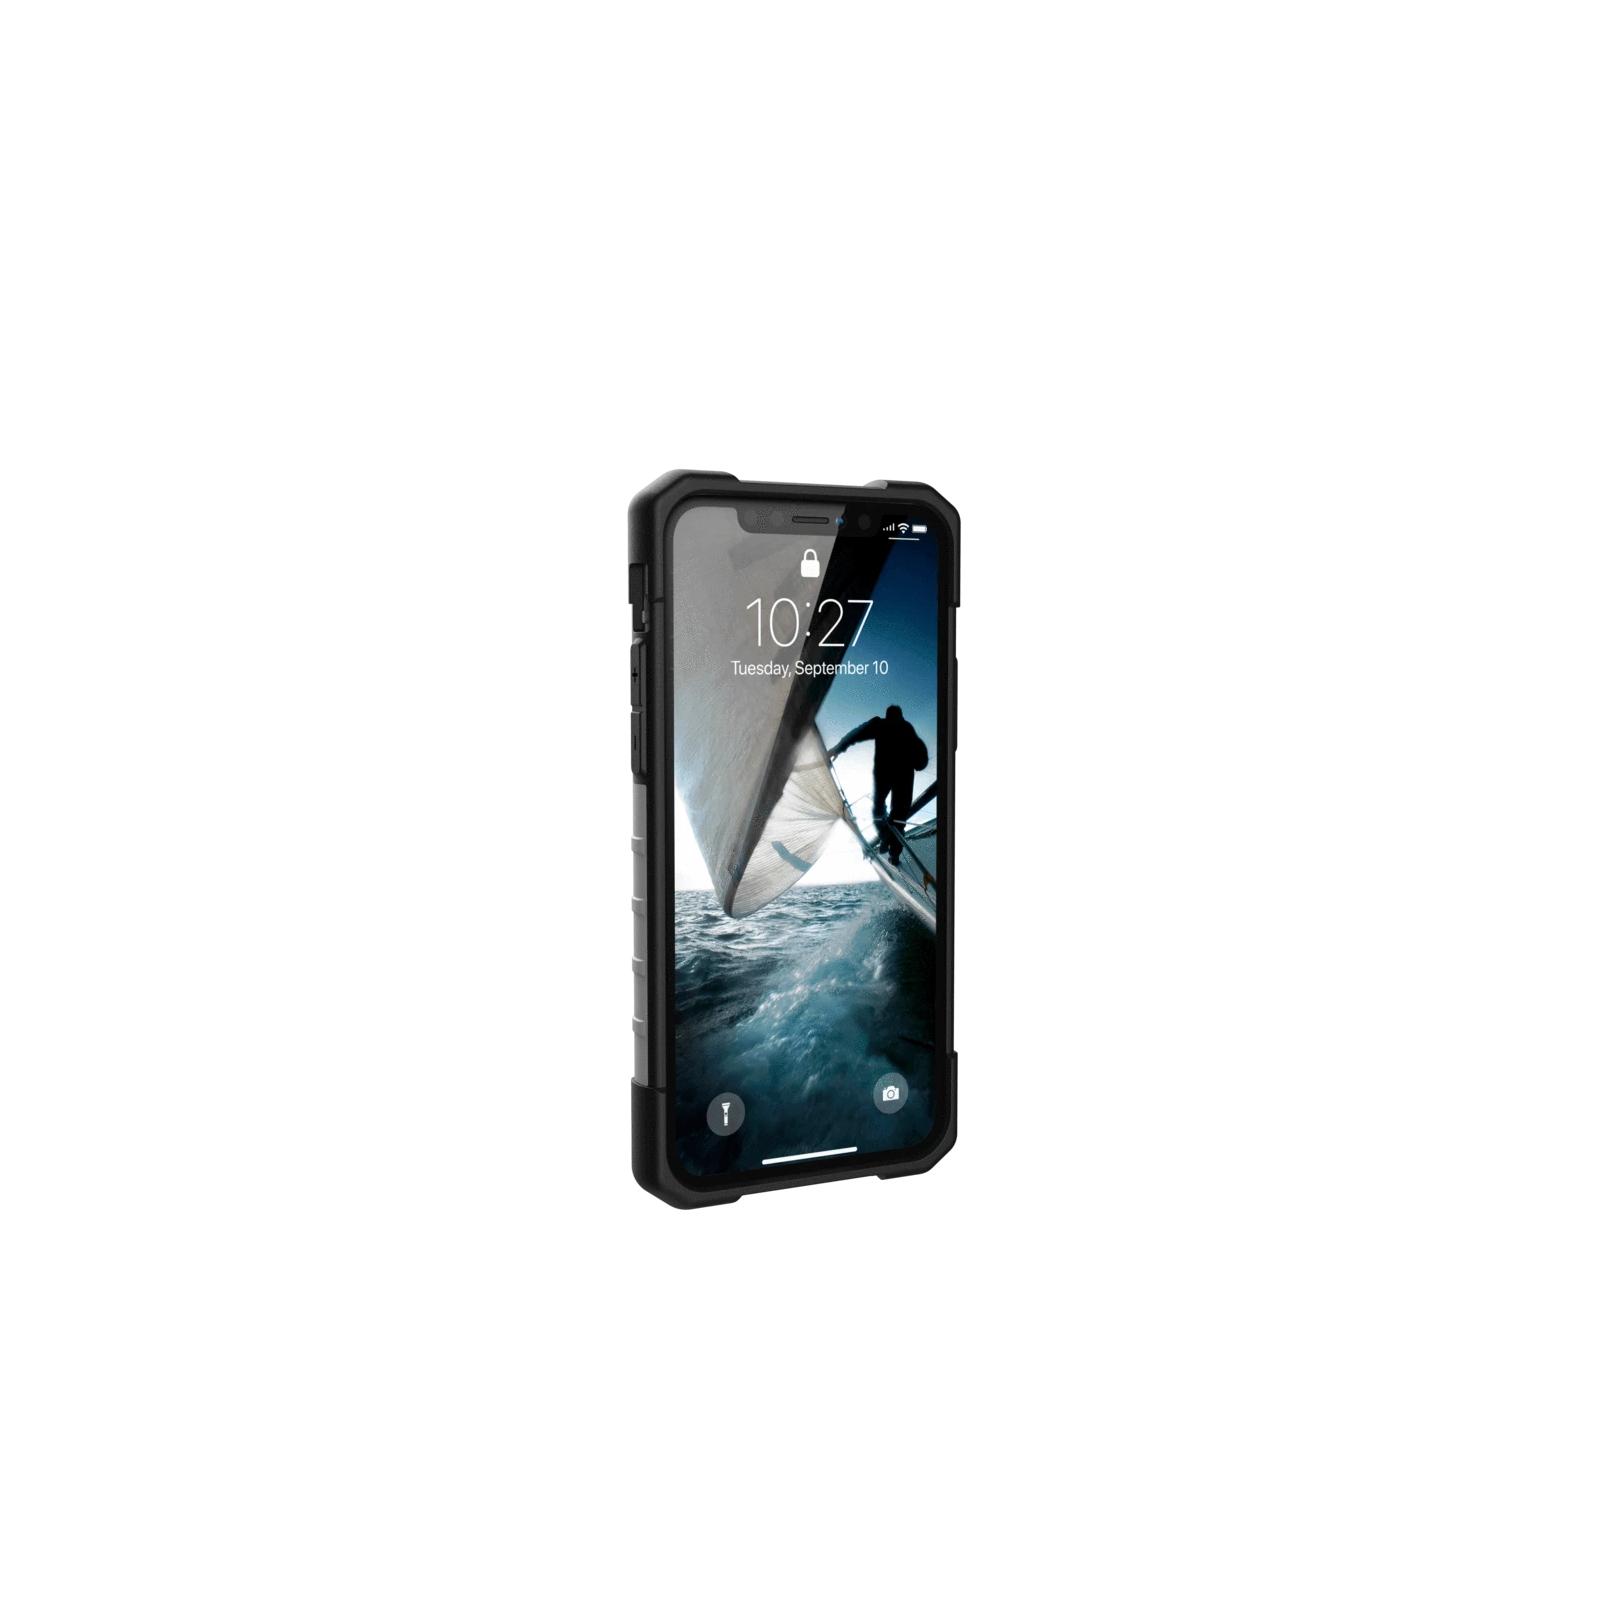 Чехол для моб. телефона Uag iPhone 11 Pro Pathfinder, White (111707114141) изображение 4